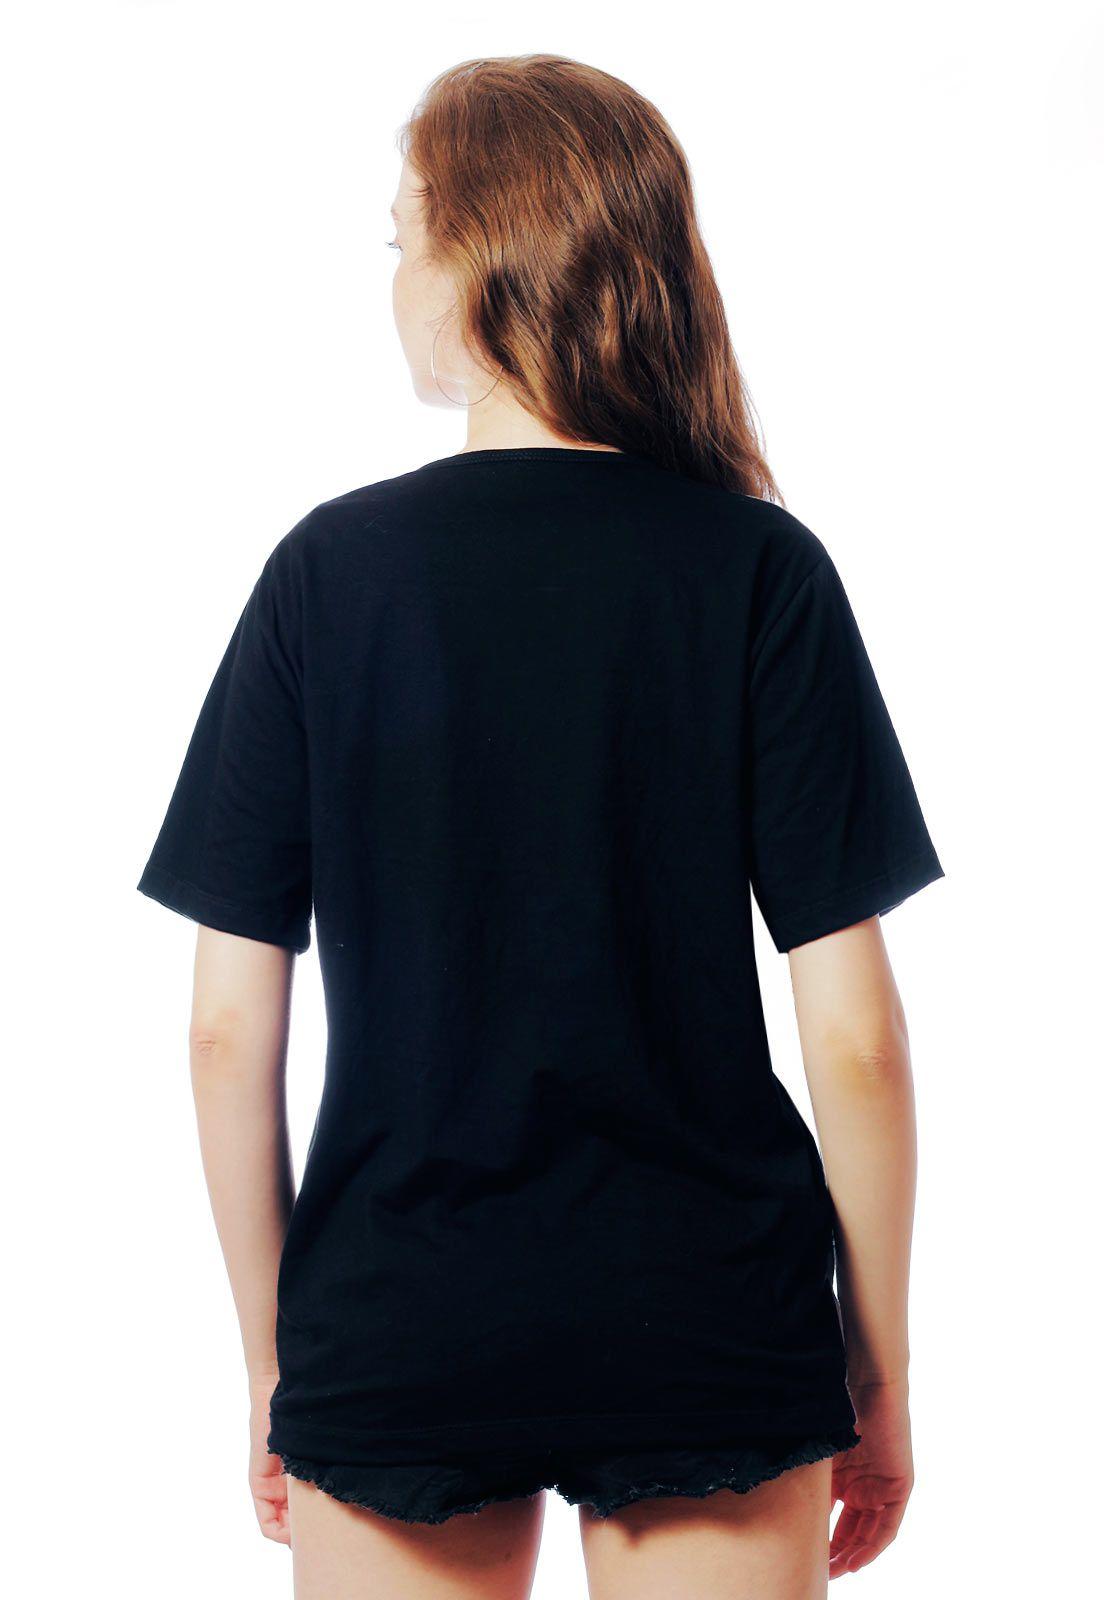 Camiseta Florida ElephunK Estampada Caveira Floral Preta